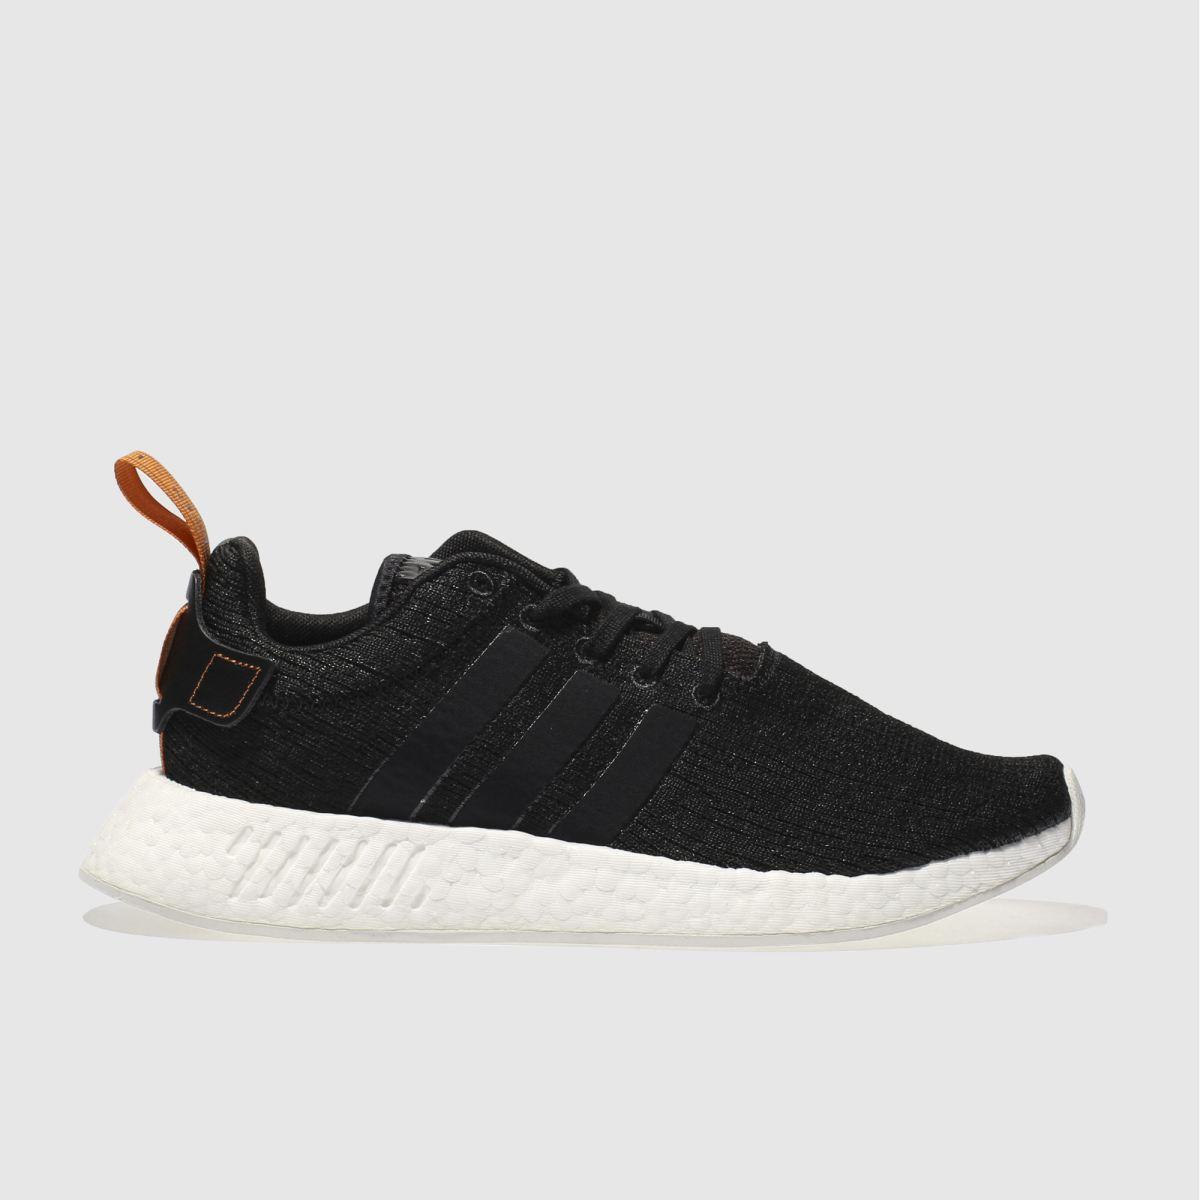 adidas black & white nmd_r2 trainers